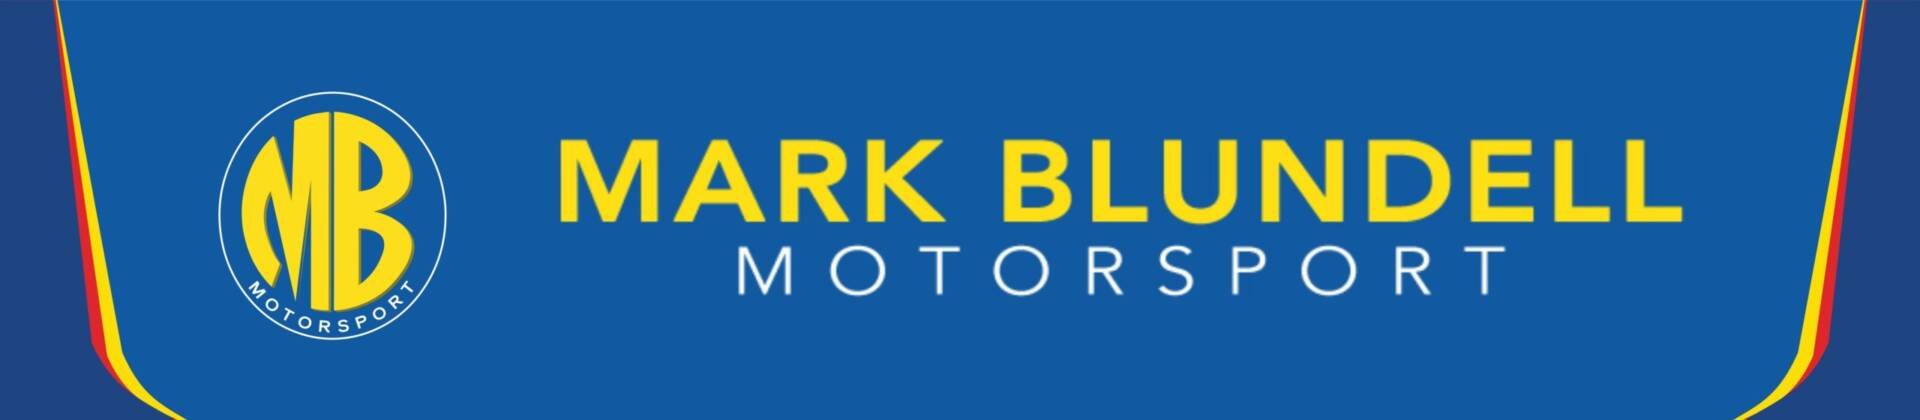 Mark Blundell Motorsport 2020 BTCC Softshell Jacket